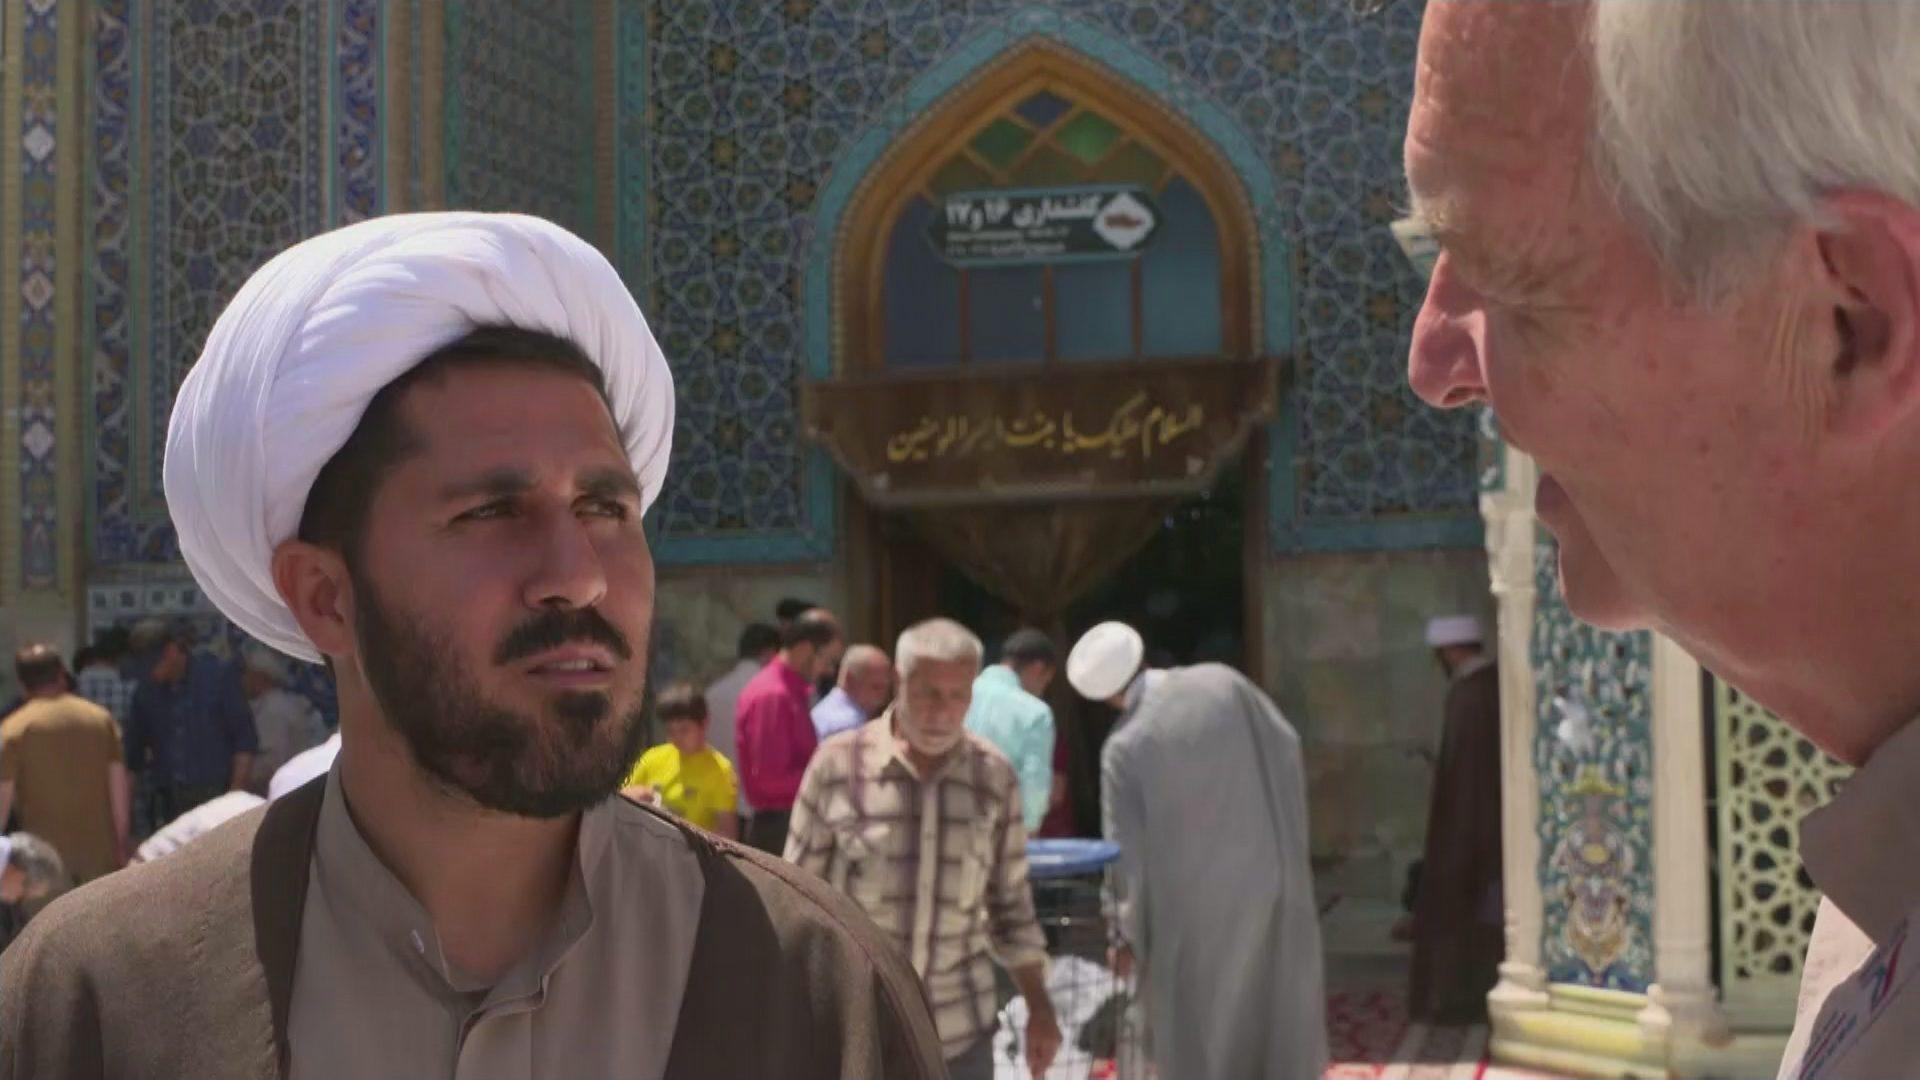 Iran's election – inside the holy city of Qom